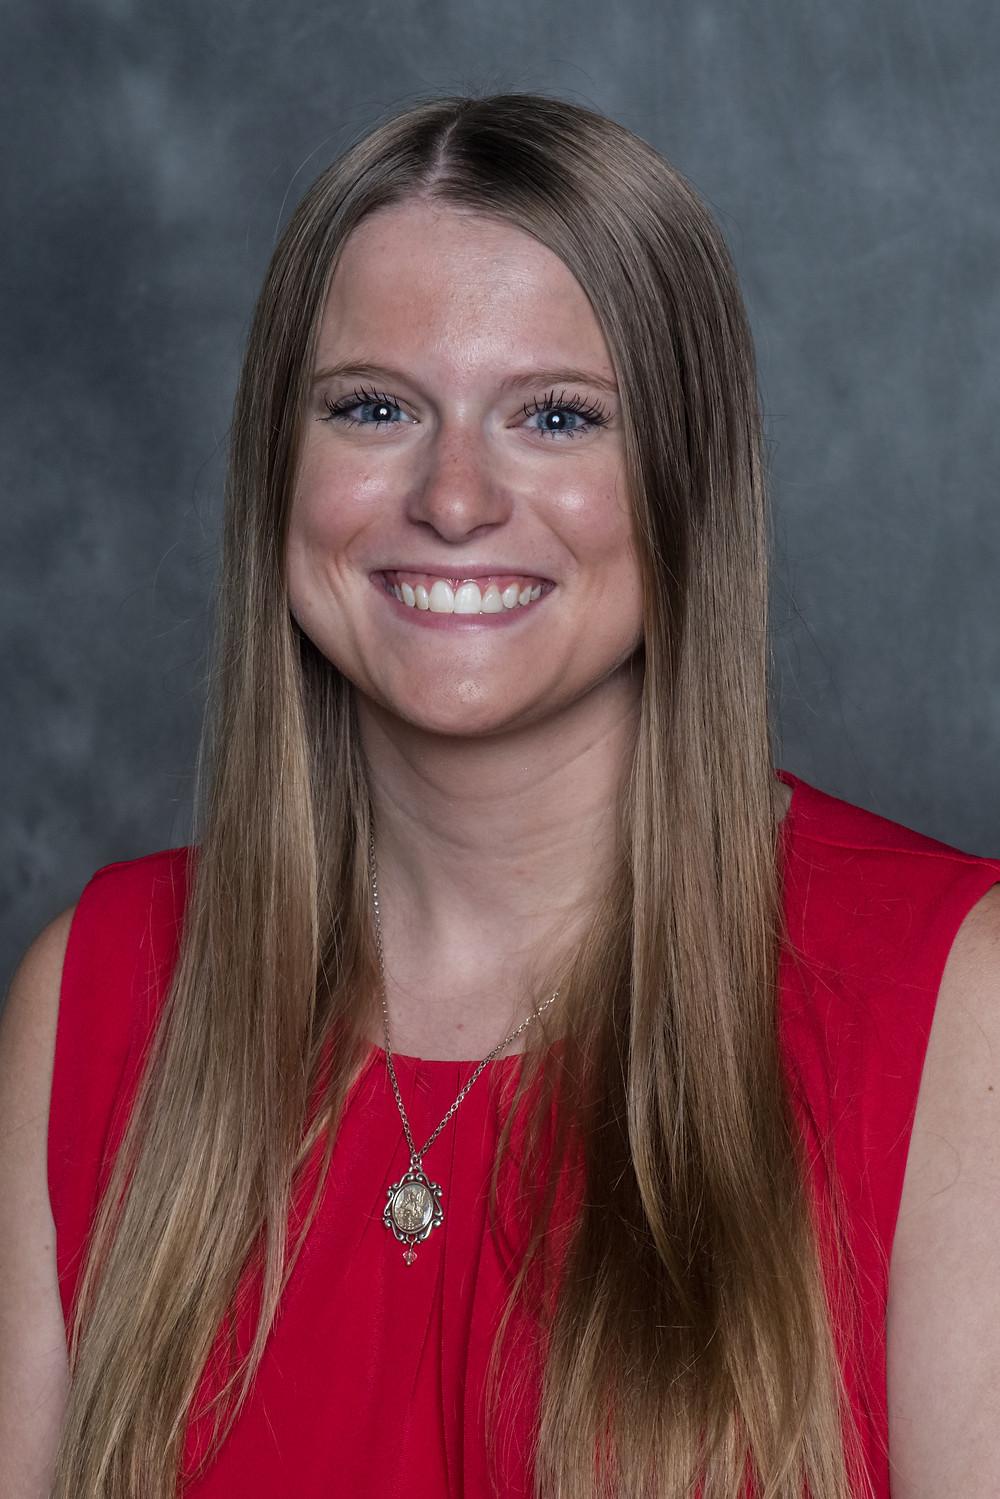 Samantha Wolfe